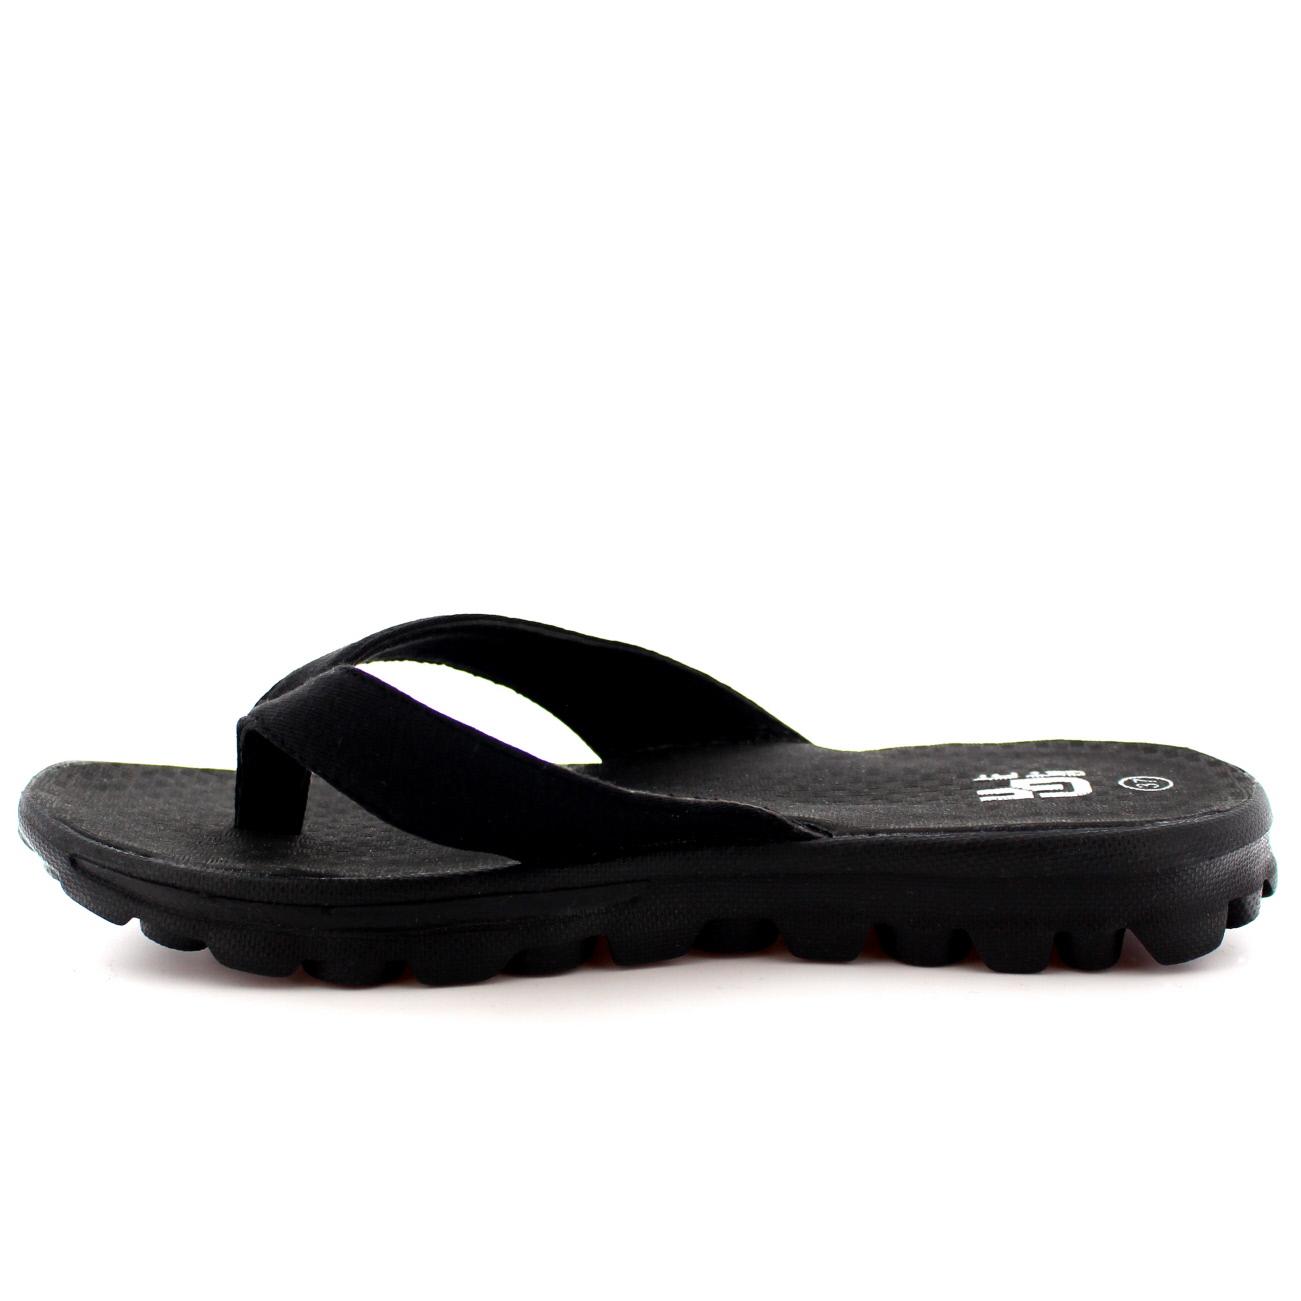 29407219bda3ab Womens Toe Post Lightweight Summer Flip Flop Walking Sports Sandal ...